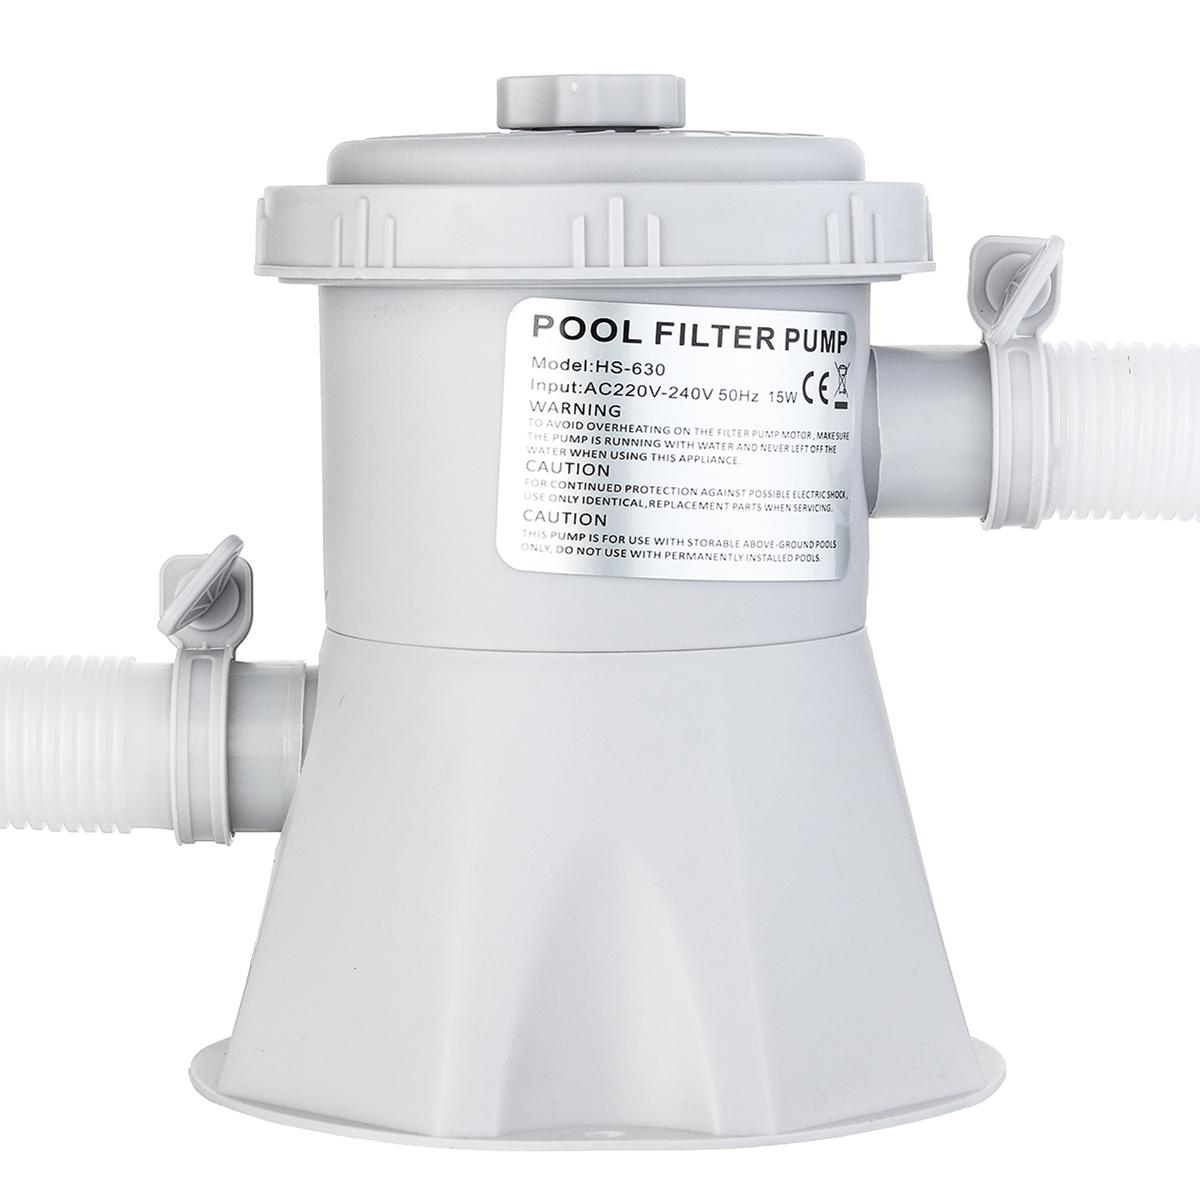 300Gal Swimming Pool Filter Pump 220V Cartridge Filter System Pool Circulating Water Pump